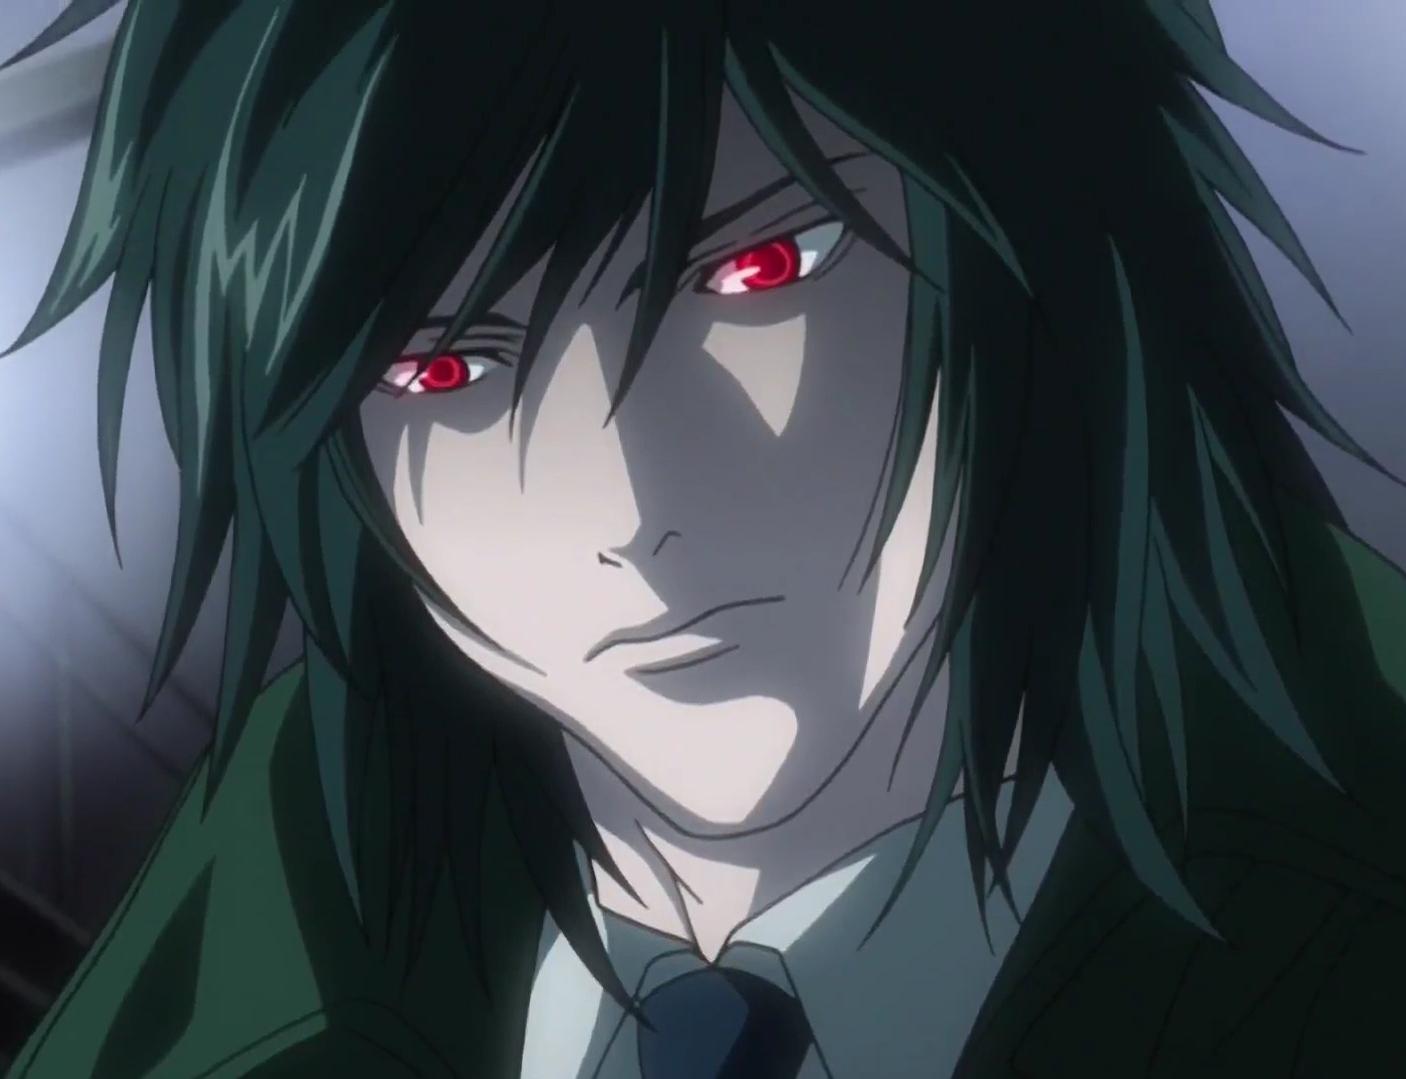 Ficheiro:Mikami's Shinigami Eyes.png